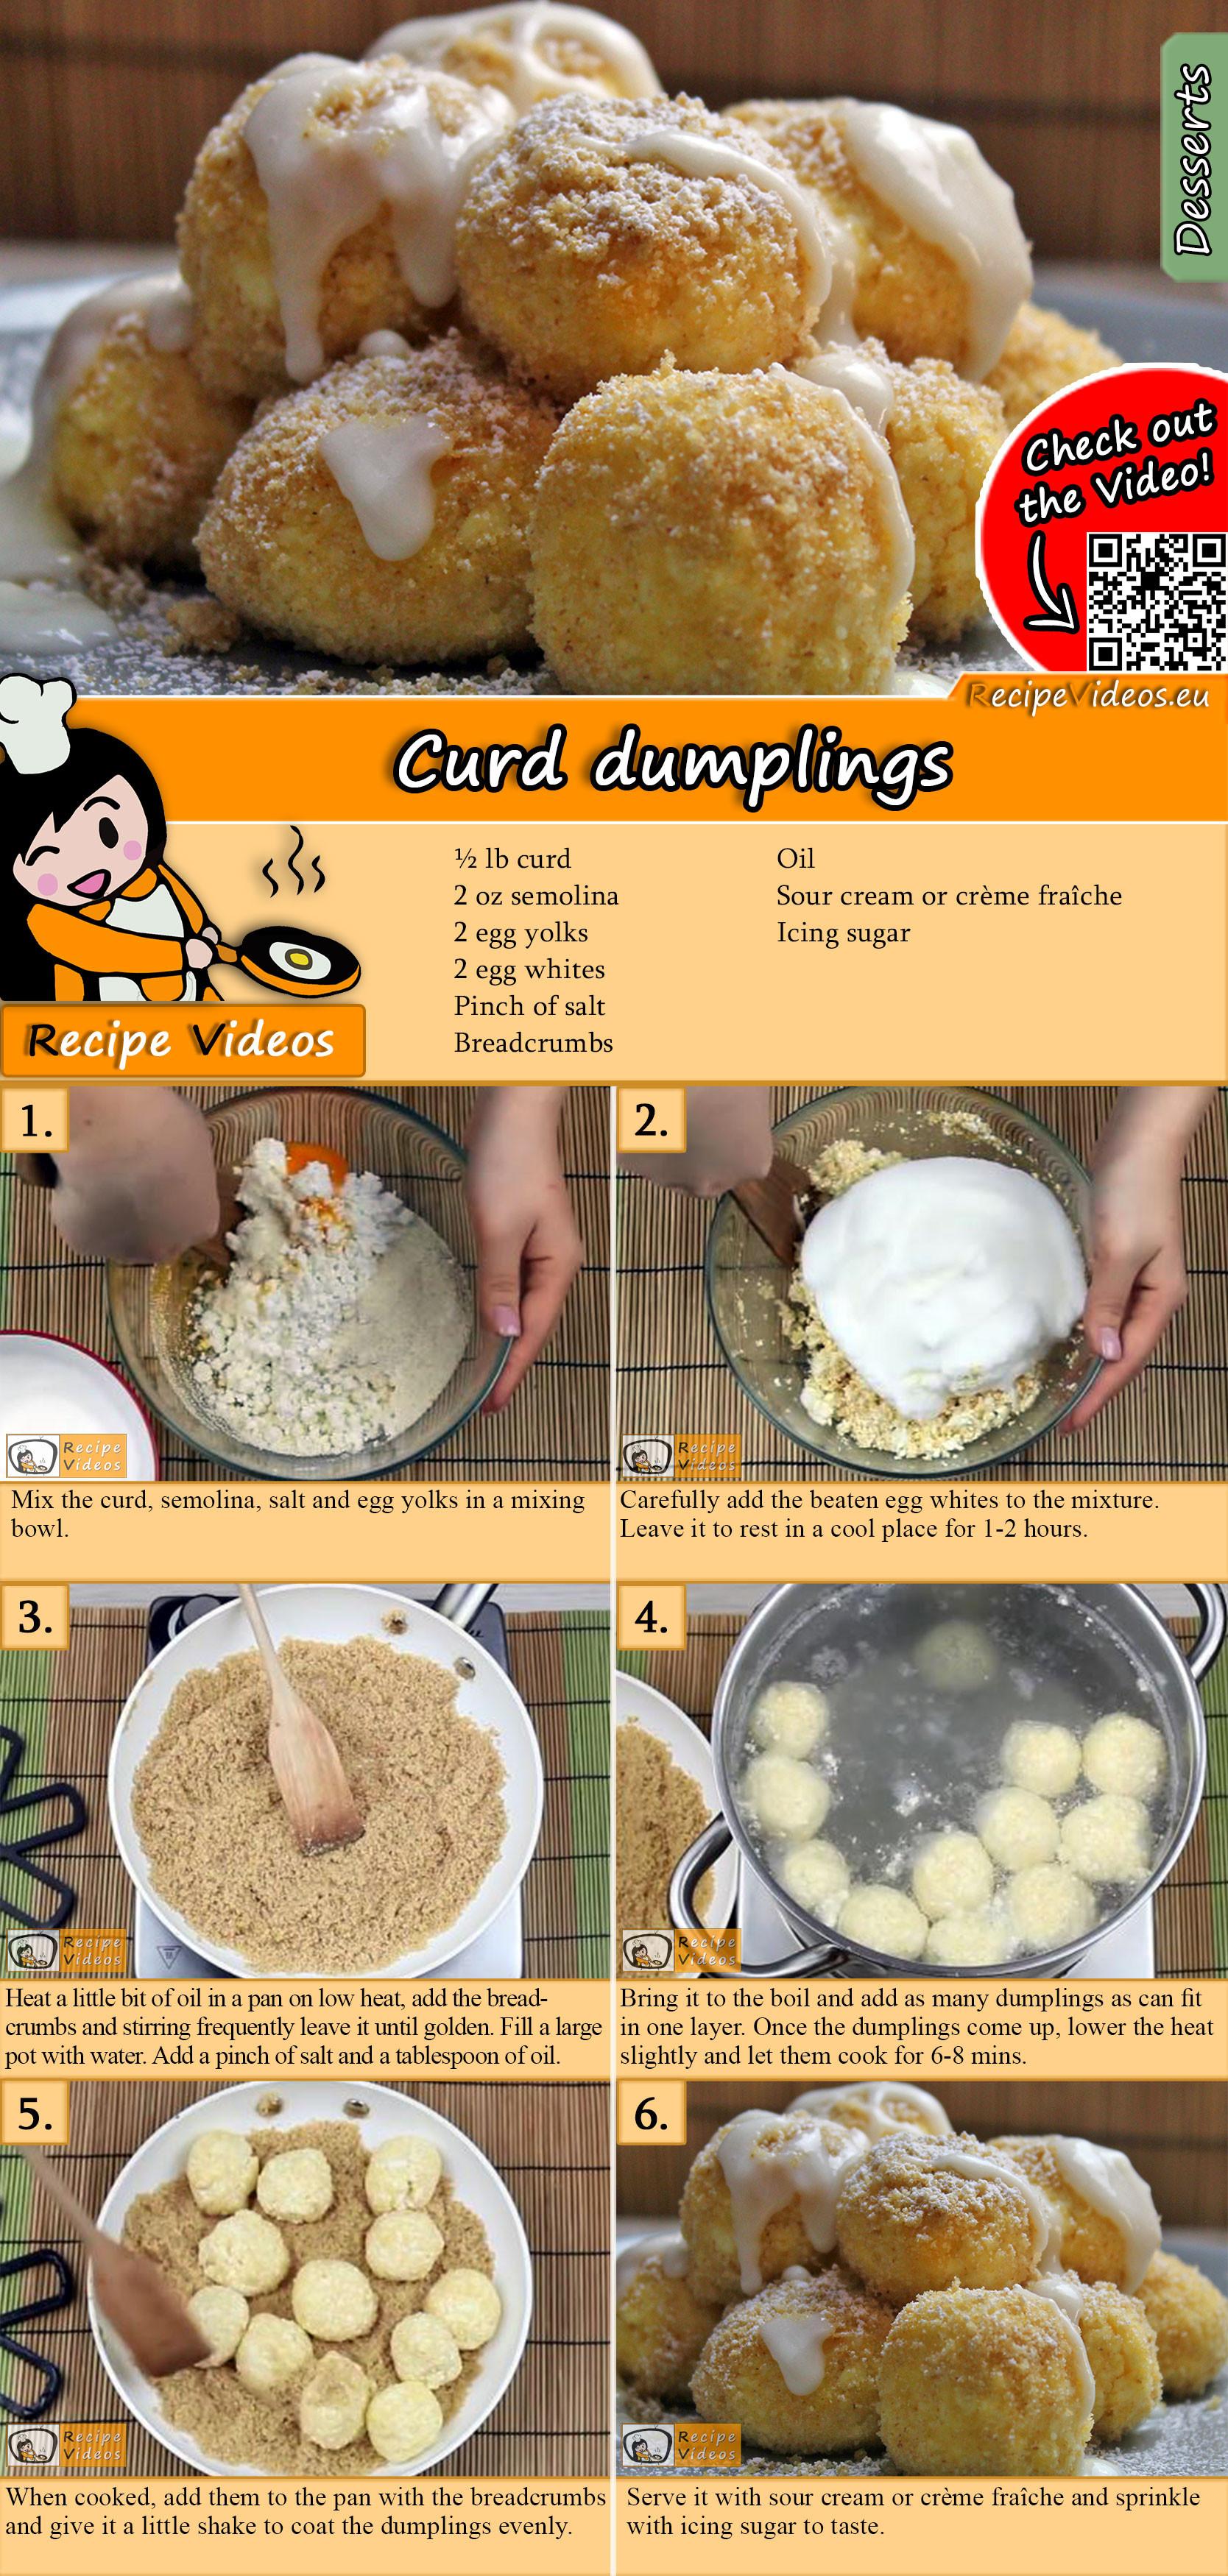 Curd dumplings recipe with video